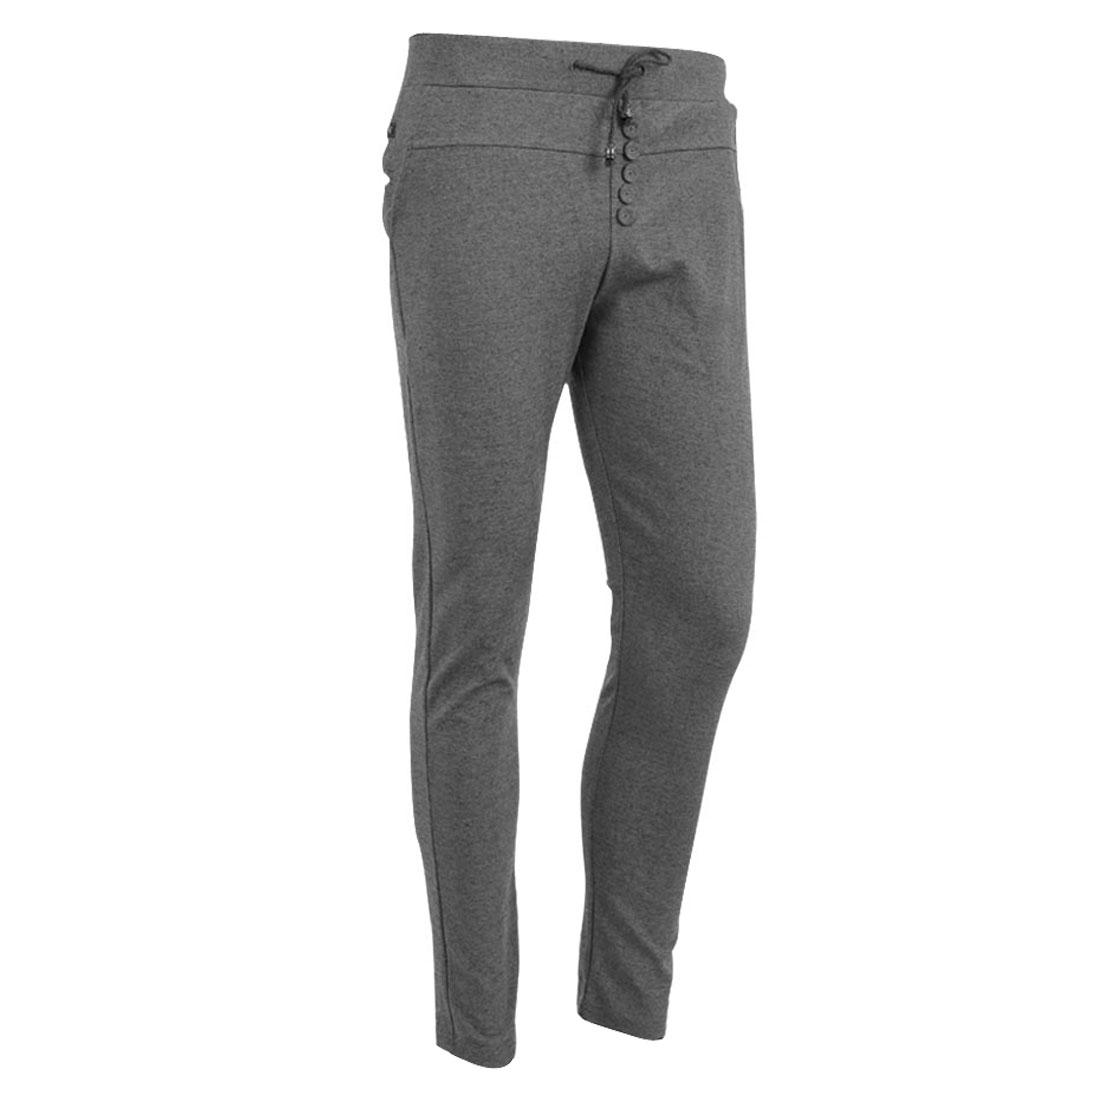 Men Stretchy Adjustable Drawstring Zippered Pocket Pants Light Gray W27